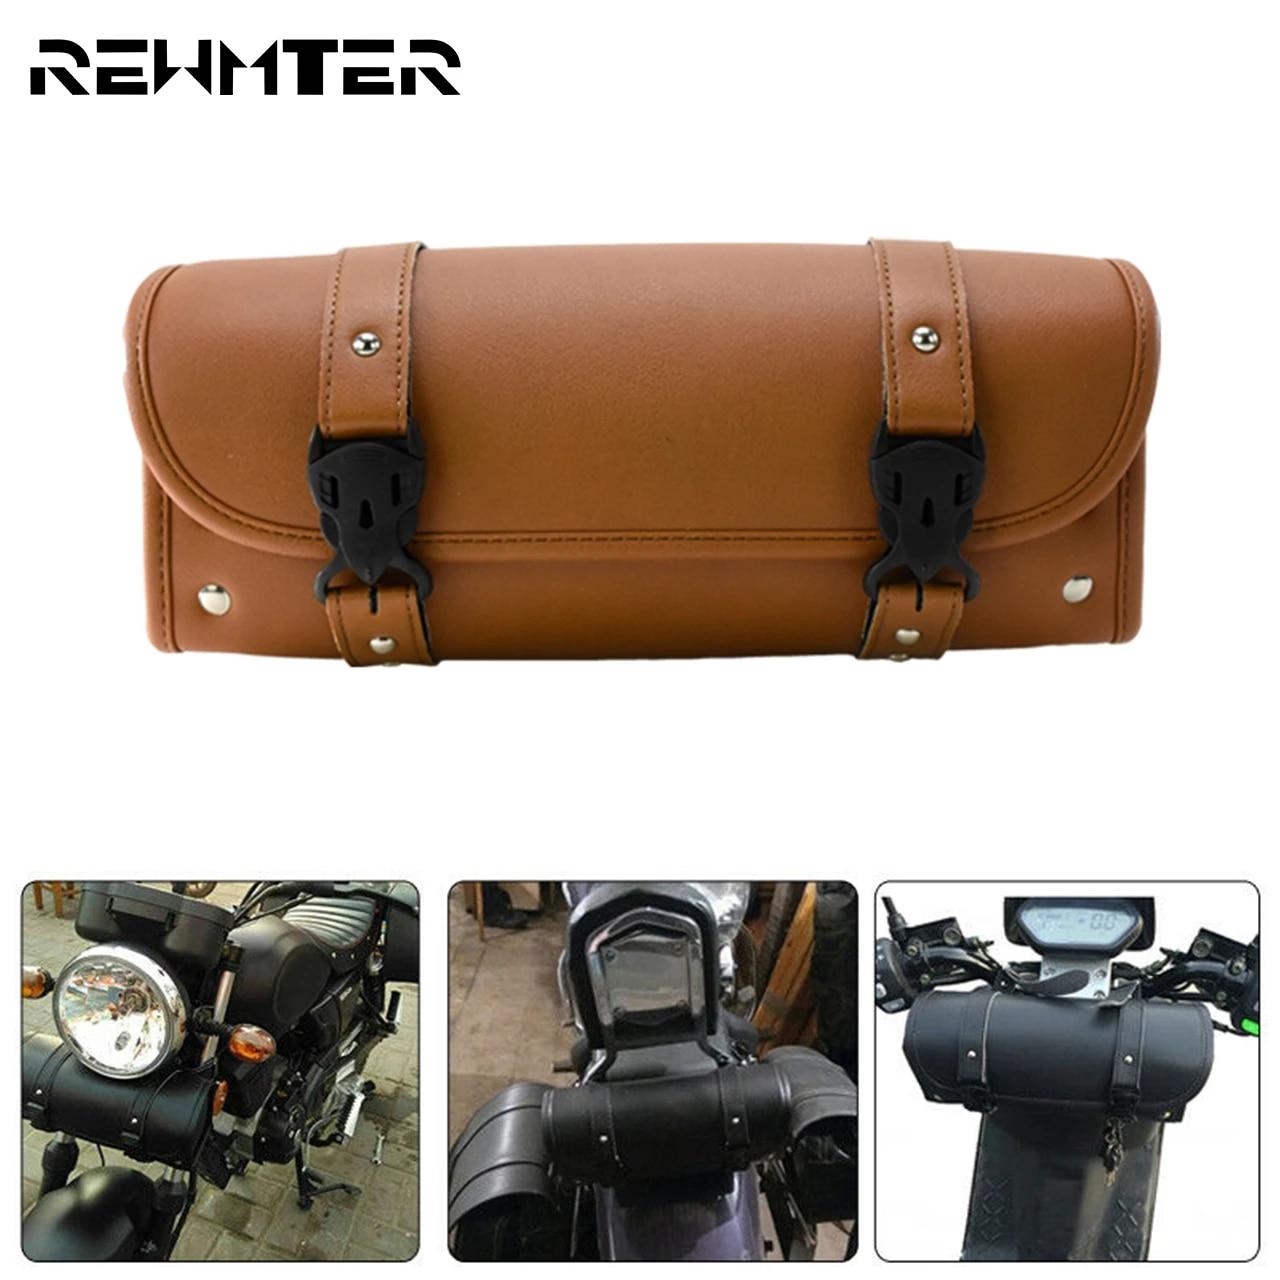 Luggage Tool Bag Saddlebag For Harley Sportster Softail Dyna Touring Chopper NEW